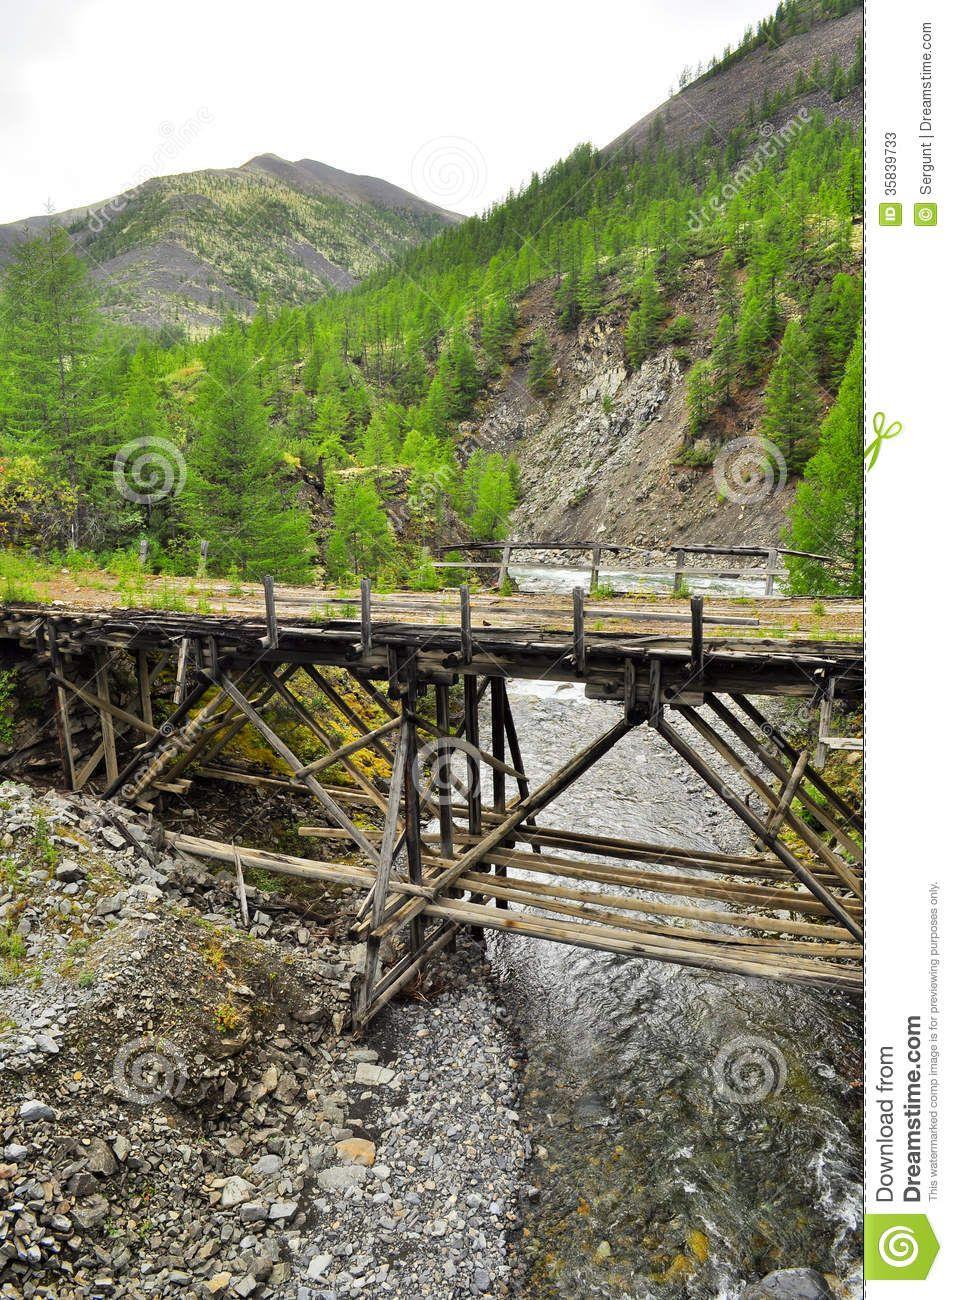 Mountain Bridge Wooden Google Search Wooden Bridge Mountain River The Mountain